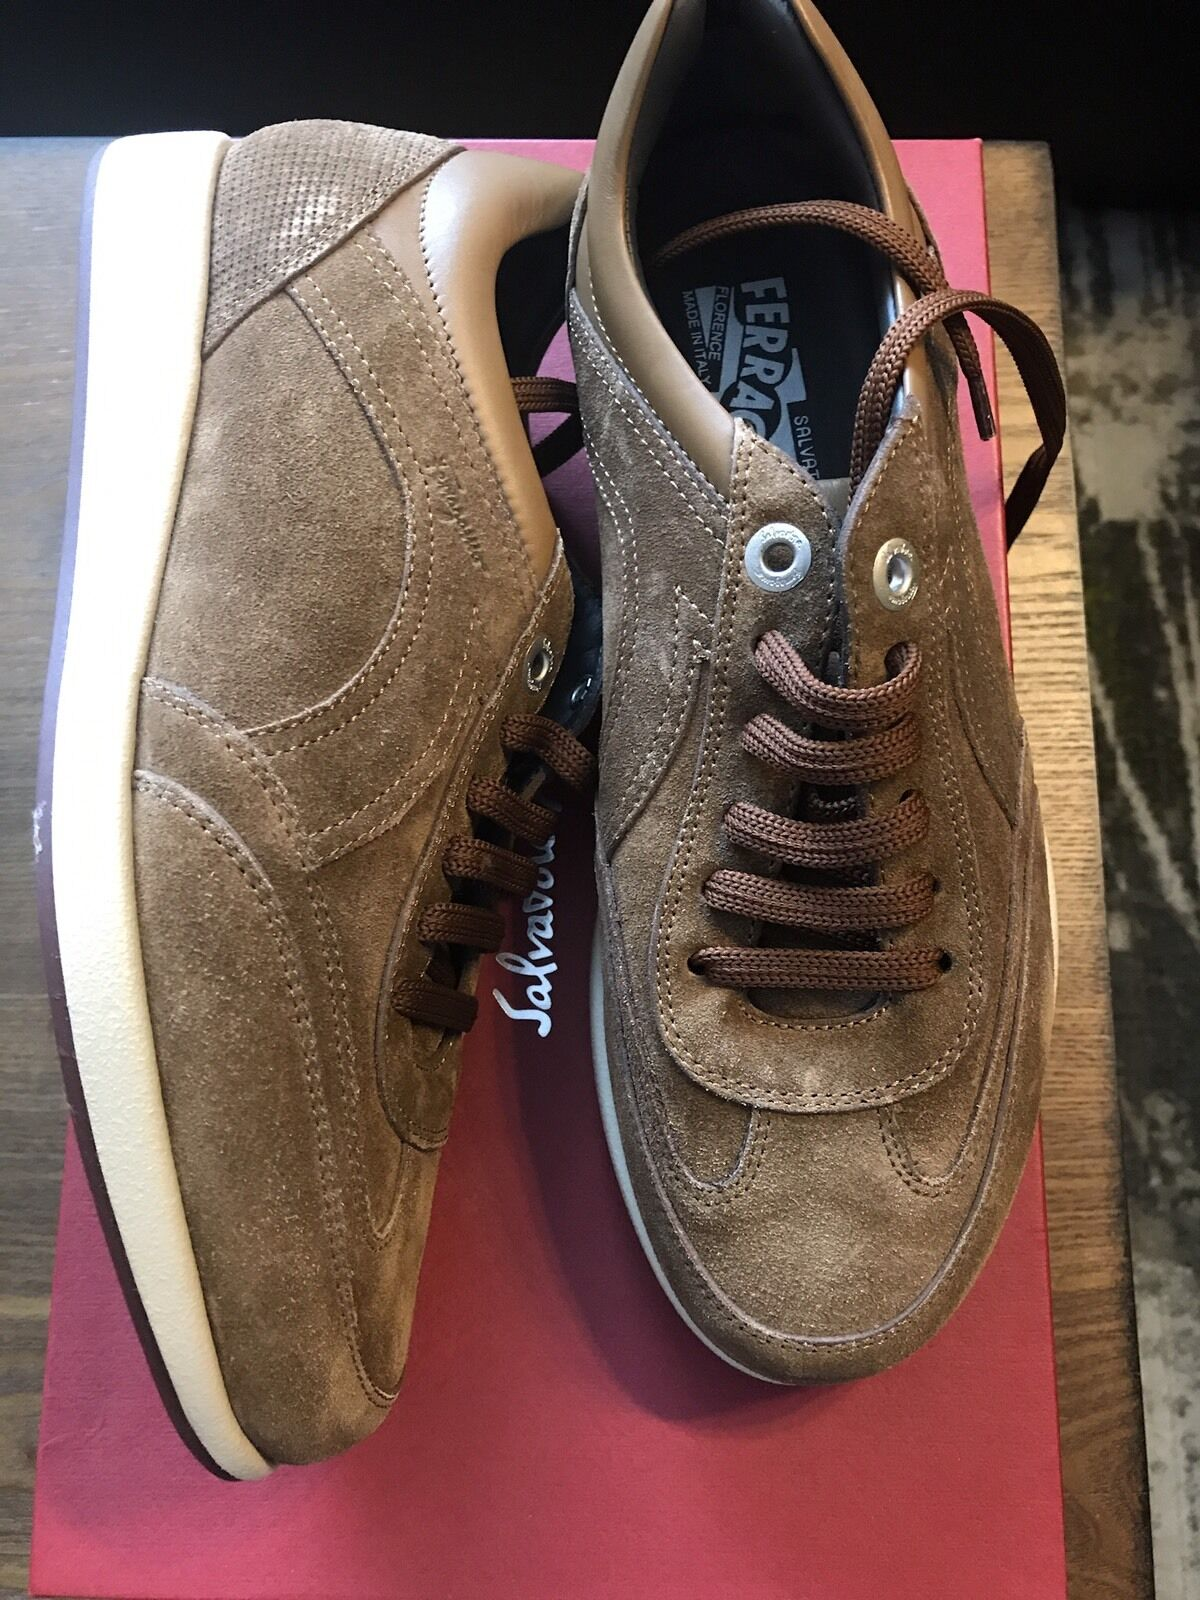 New Authentic Salvatore Ferragamo Hare Brown Suede Lace Men Shoe Sneakers 6 540